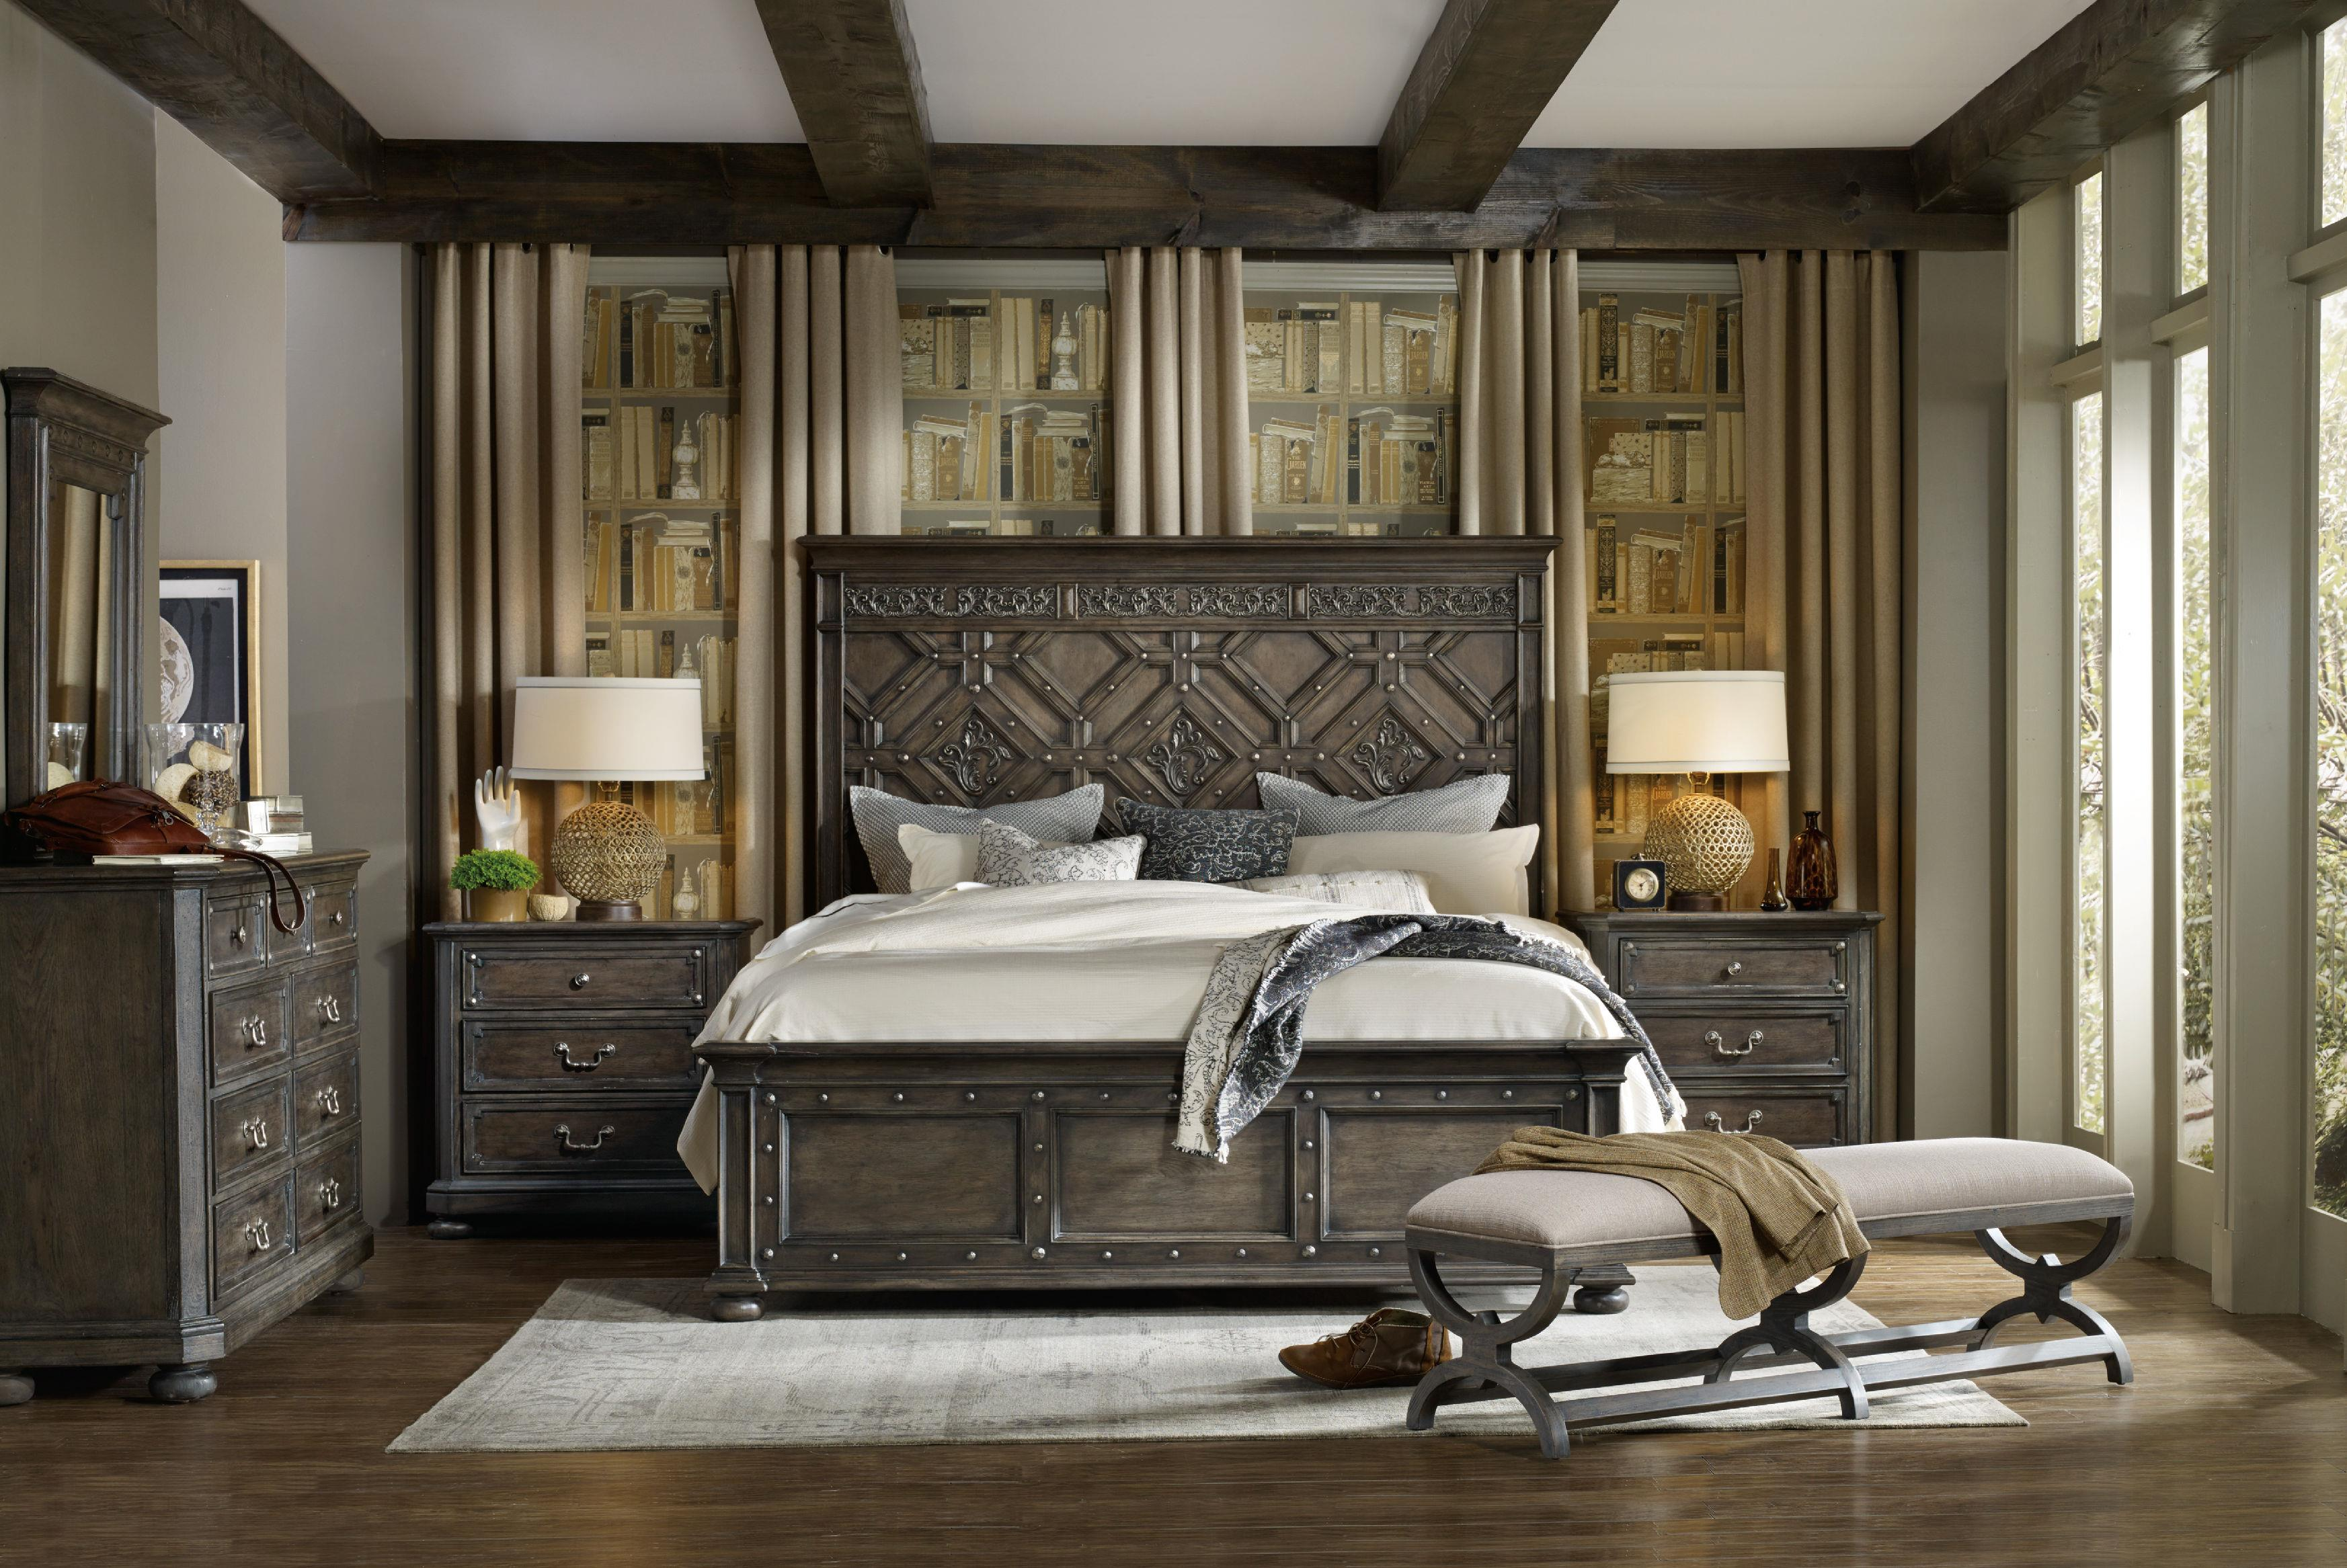 hooker furniture.  Hooker By Hooker Furniture California King Bedroom Group Intended Furniture